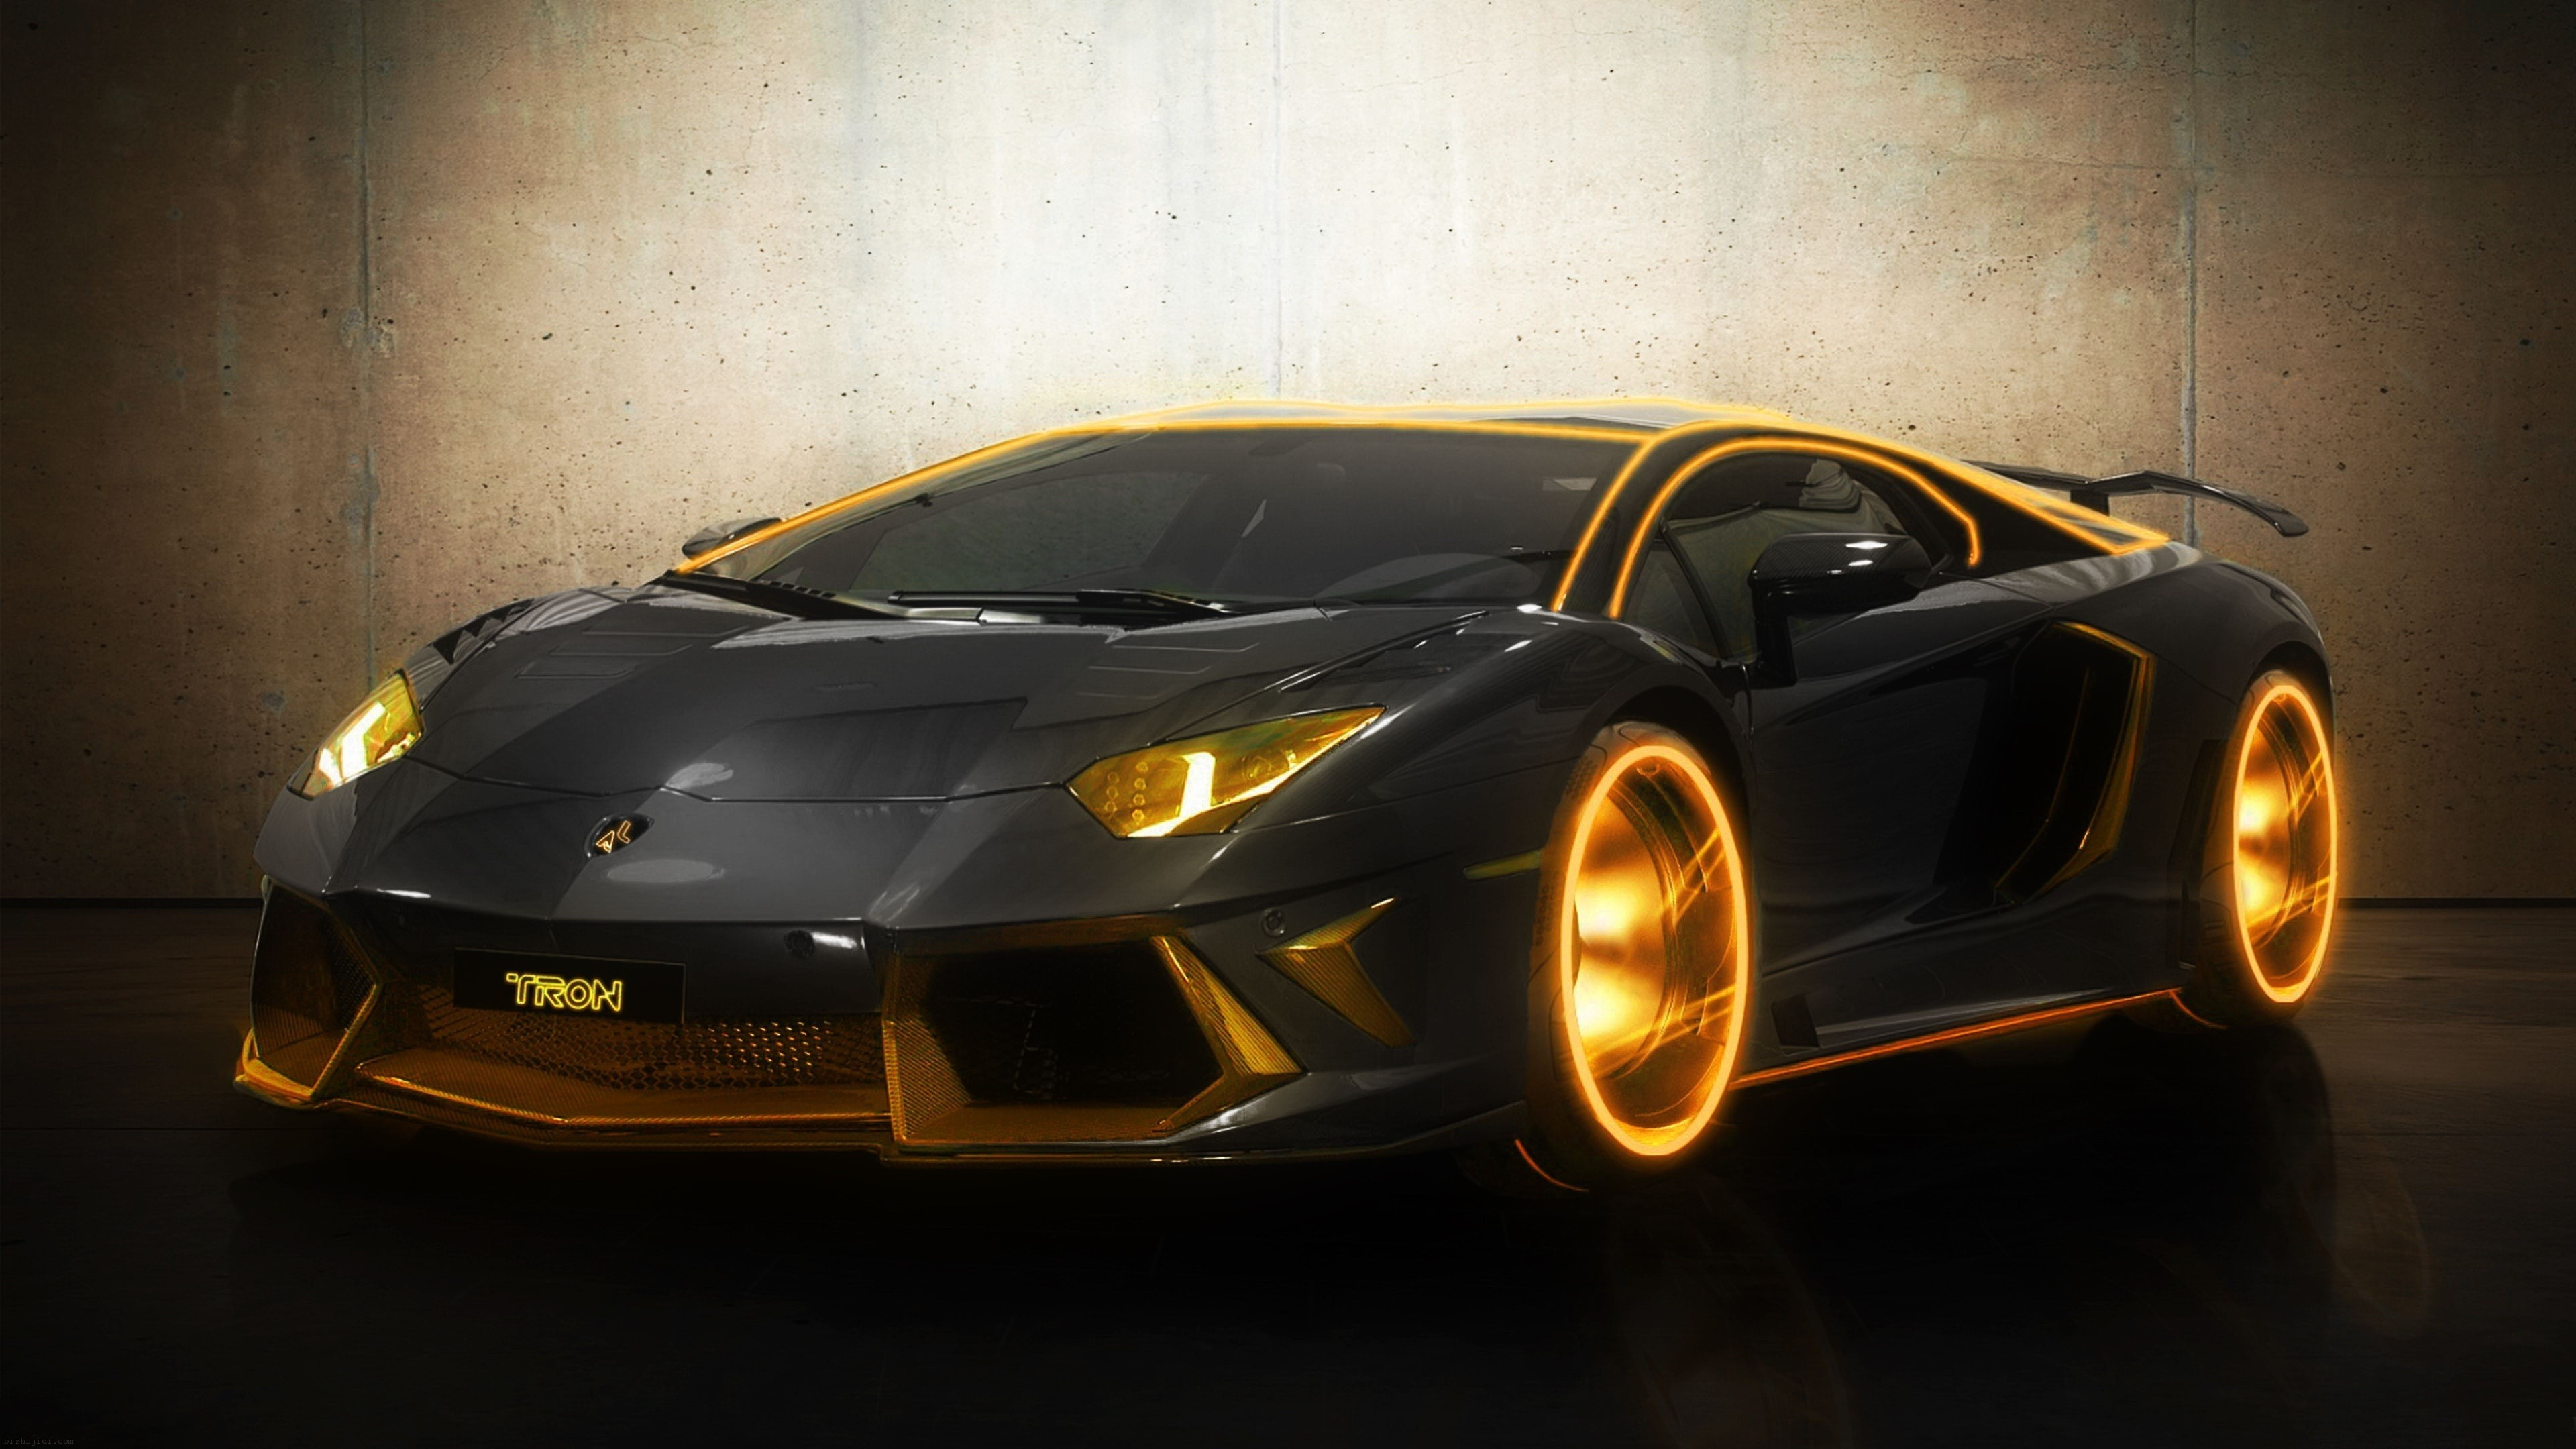 Pin Gold Cool Cars Wallpaper on Pinterest 0 HTML code. Lamborghini  Aventador Tron Edition – Gear Heads